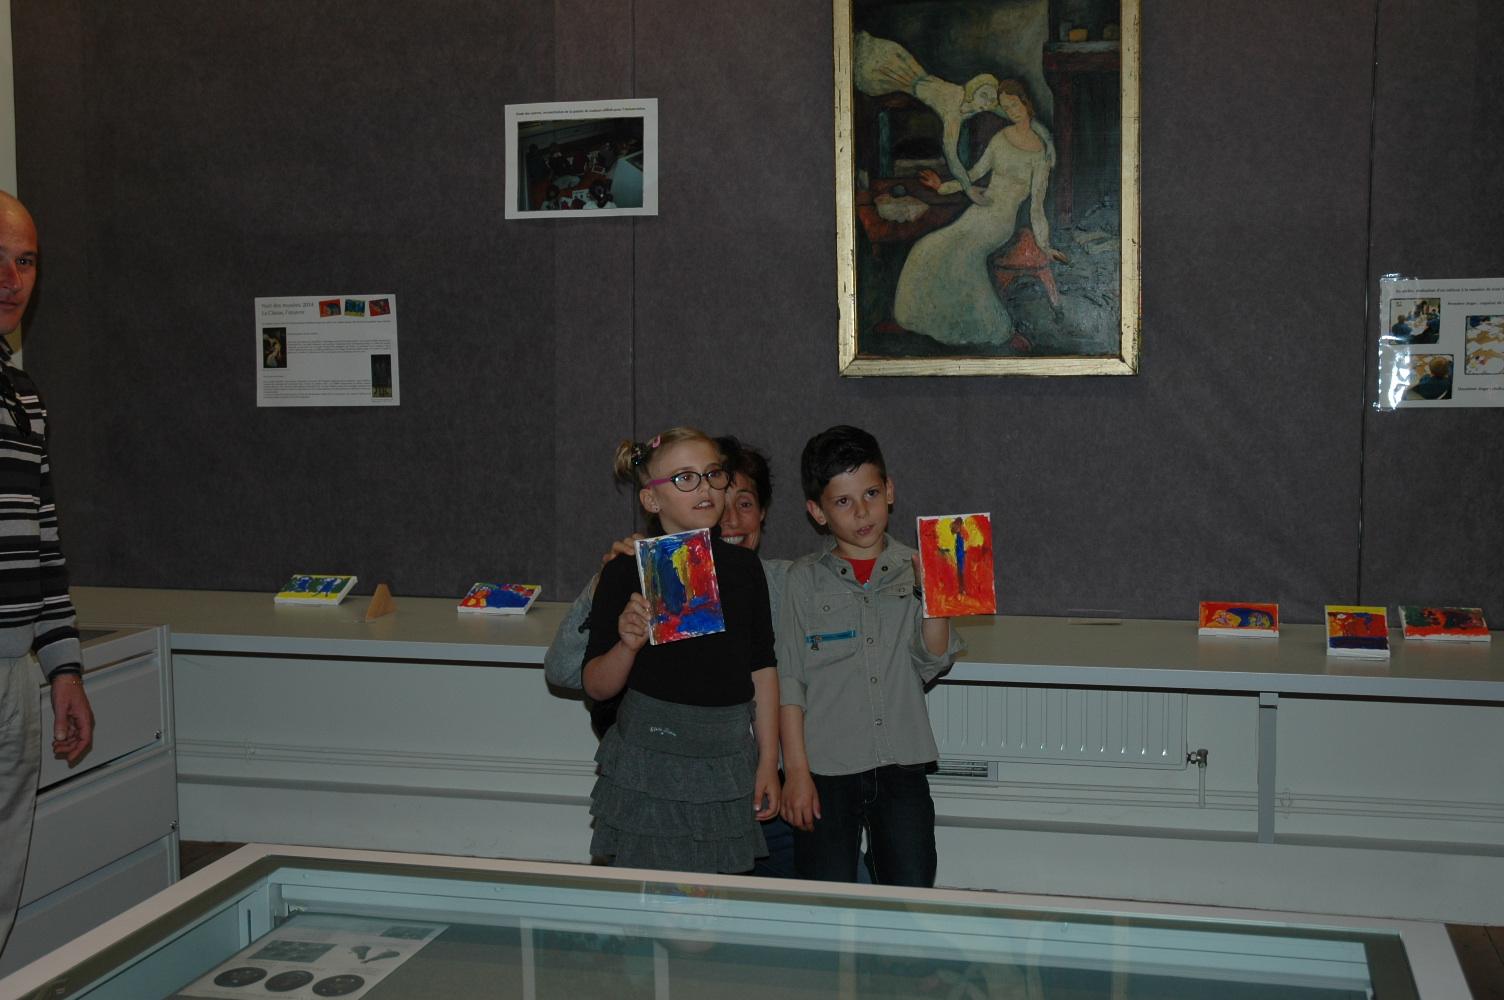 Ilona et Gustavo avec leur oeuvre